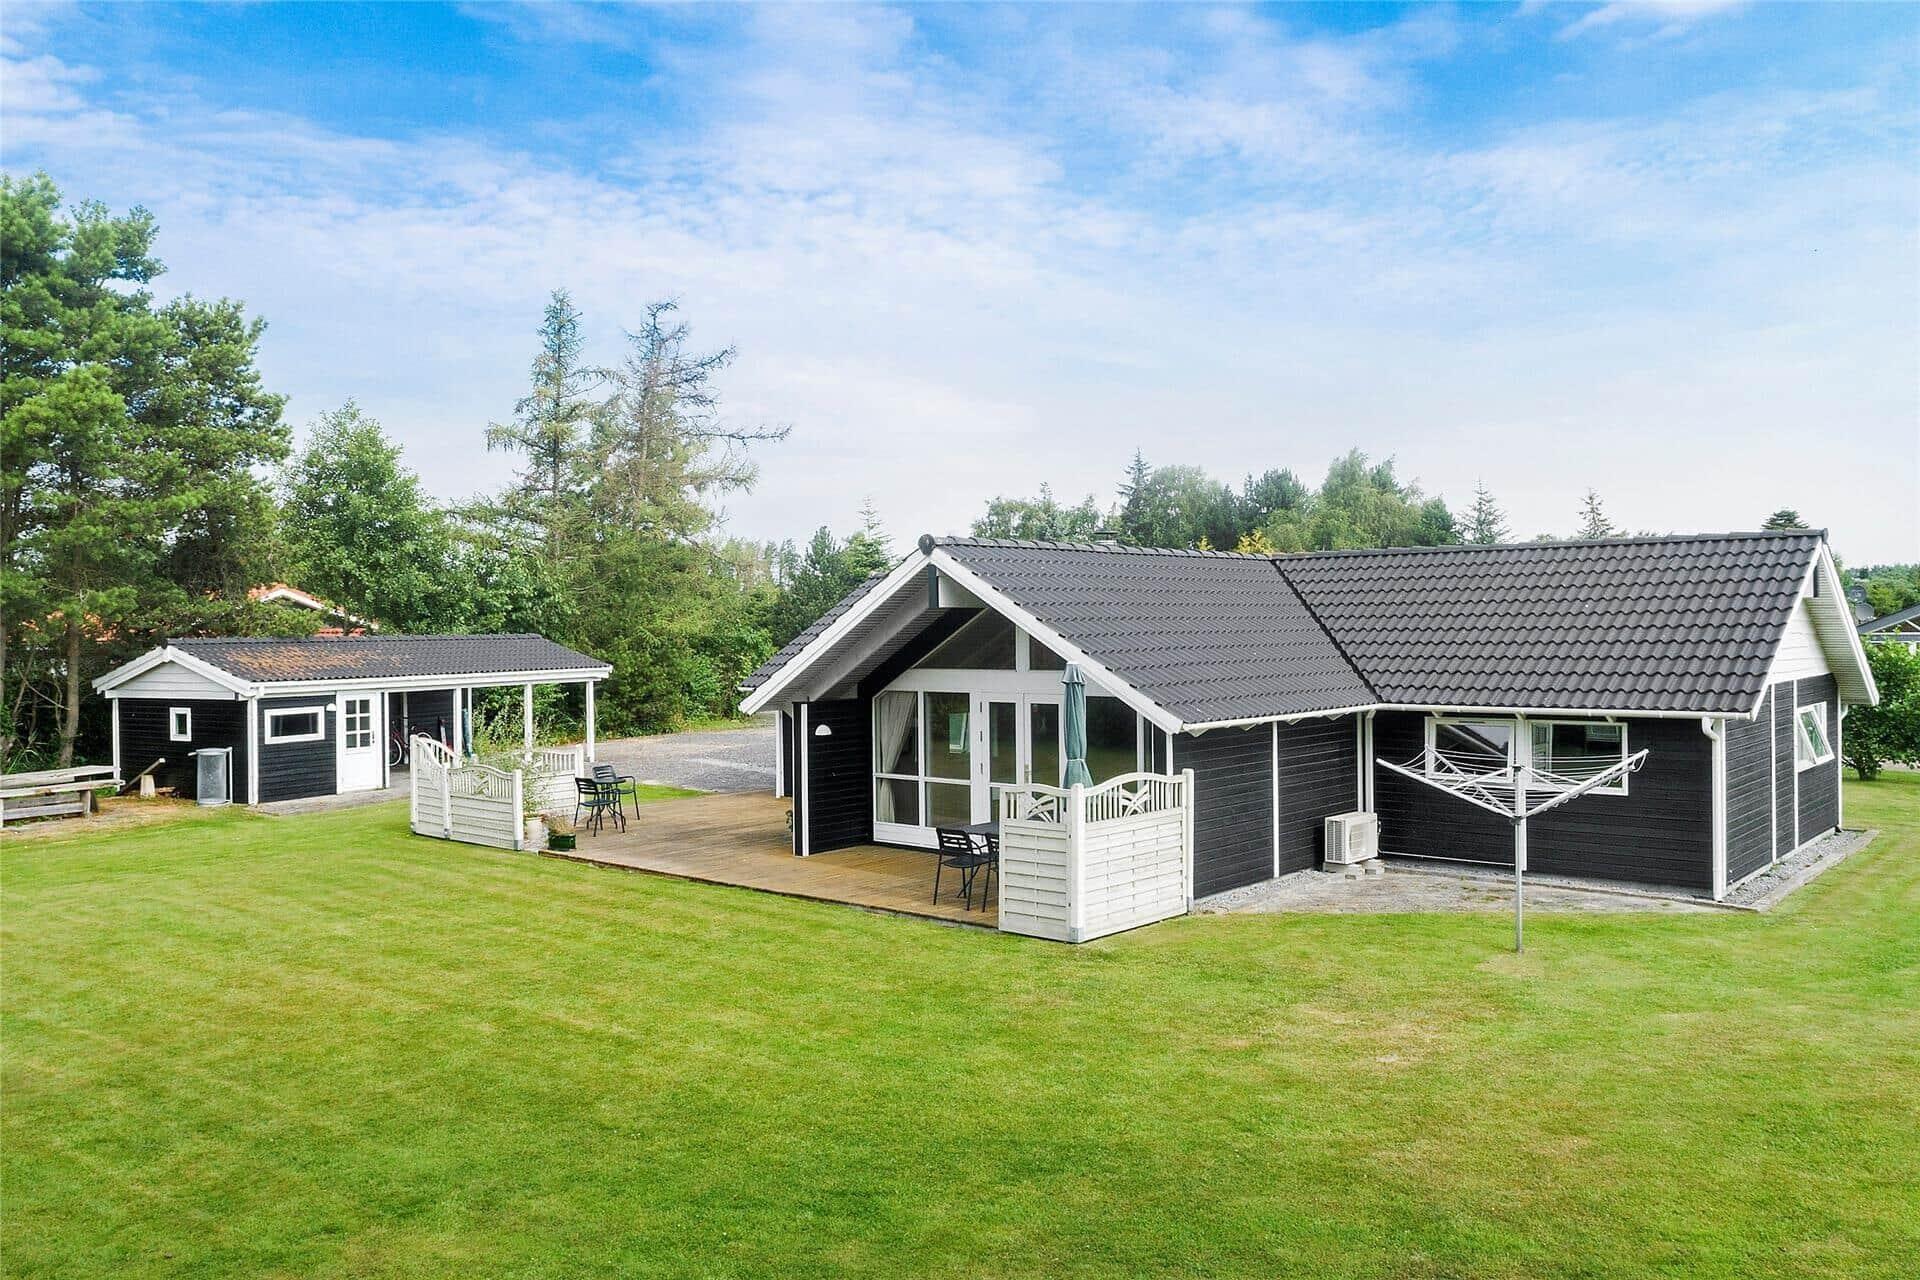 Billede 1-174 Sommerhus M15013, Klintevej 3, DK - 4873 Væggerløse